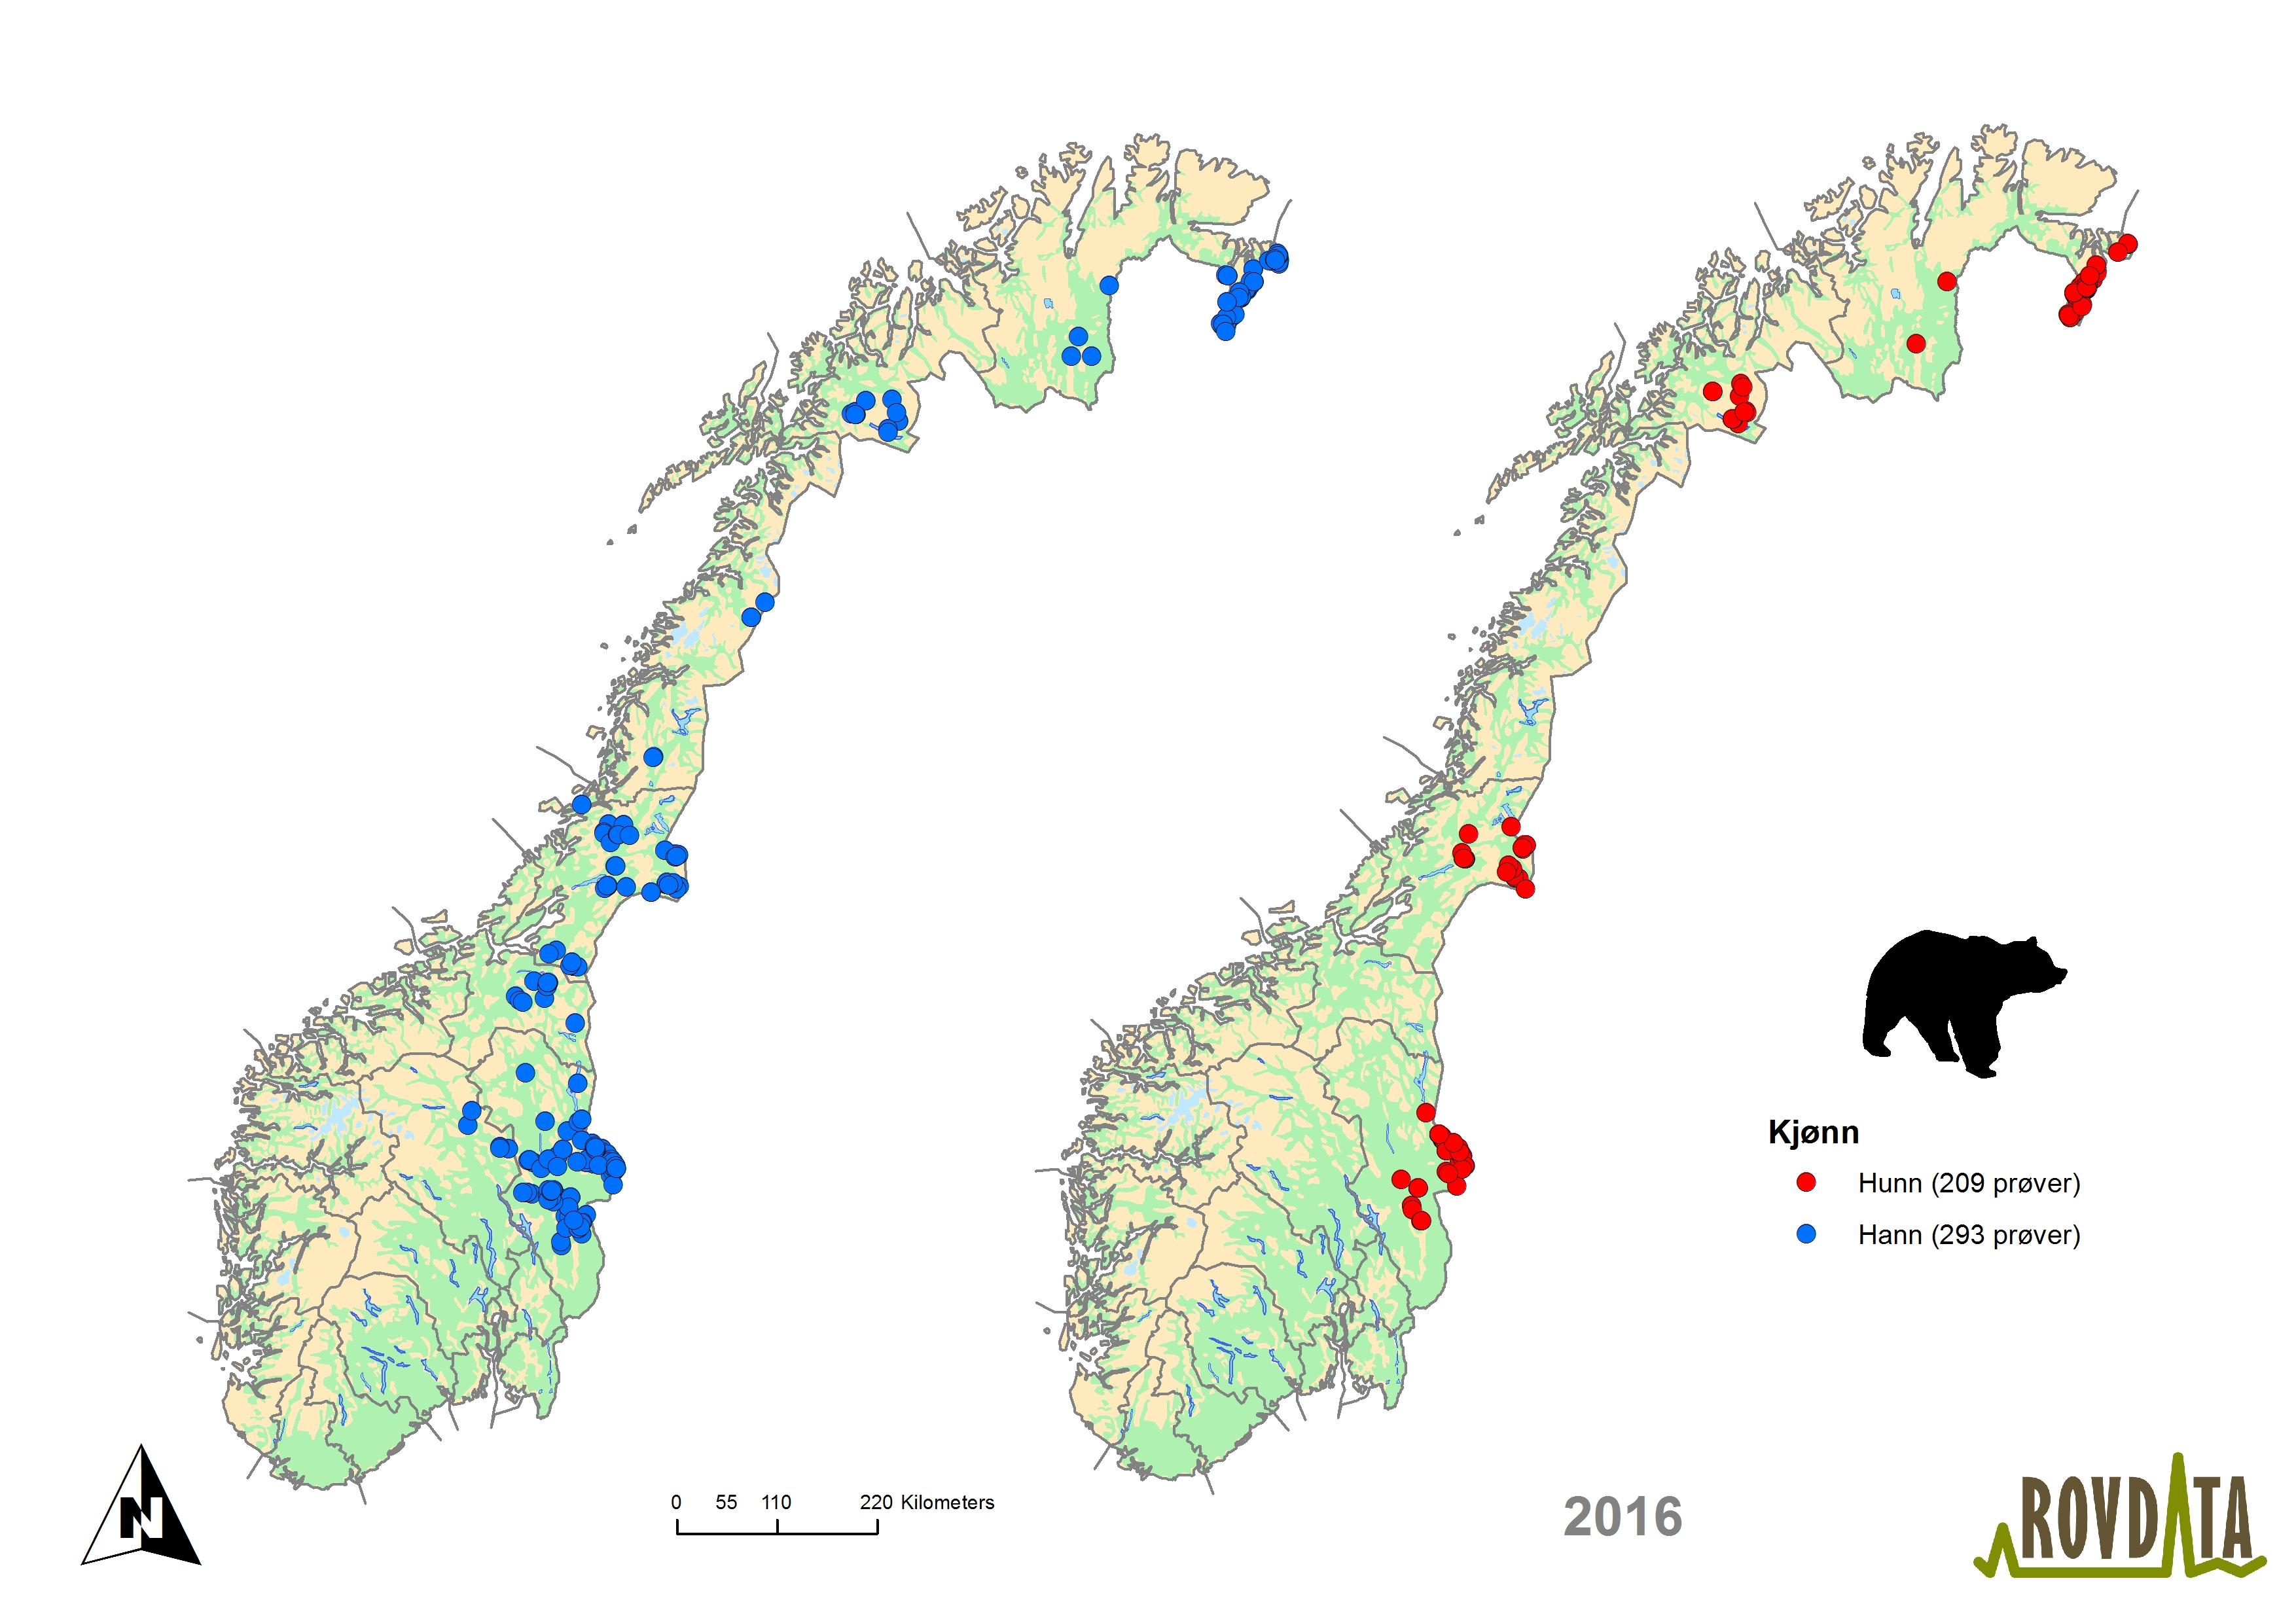 digitalt kart norge Rovdata   Last ned kart og figurer, brunbjørn digitalt kart norge